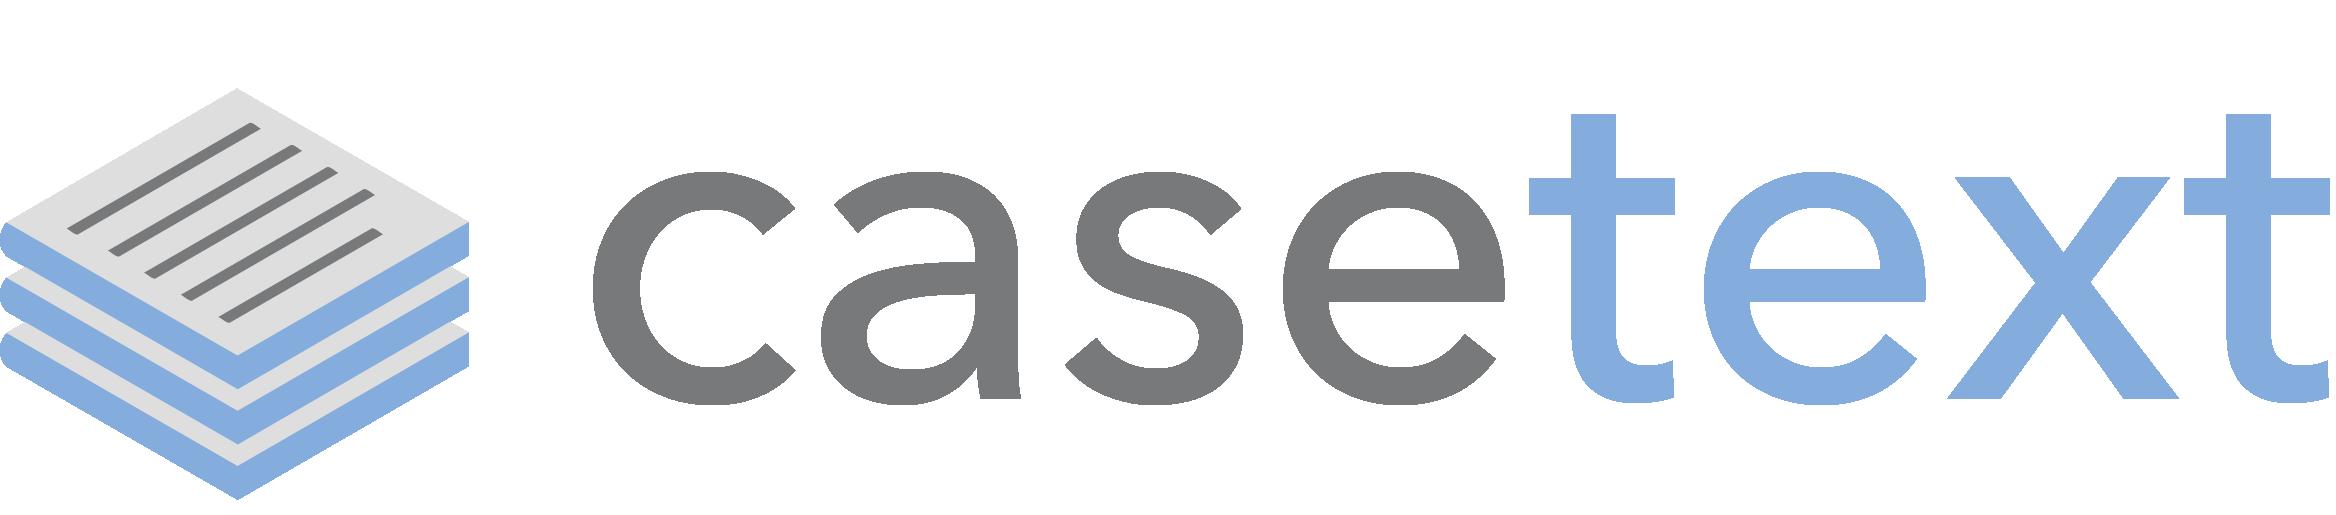 Casetext-logo